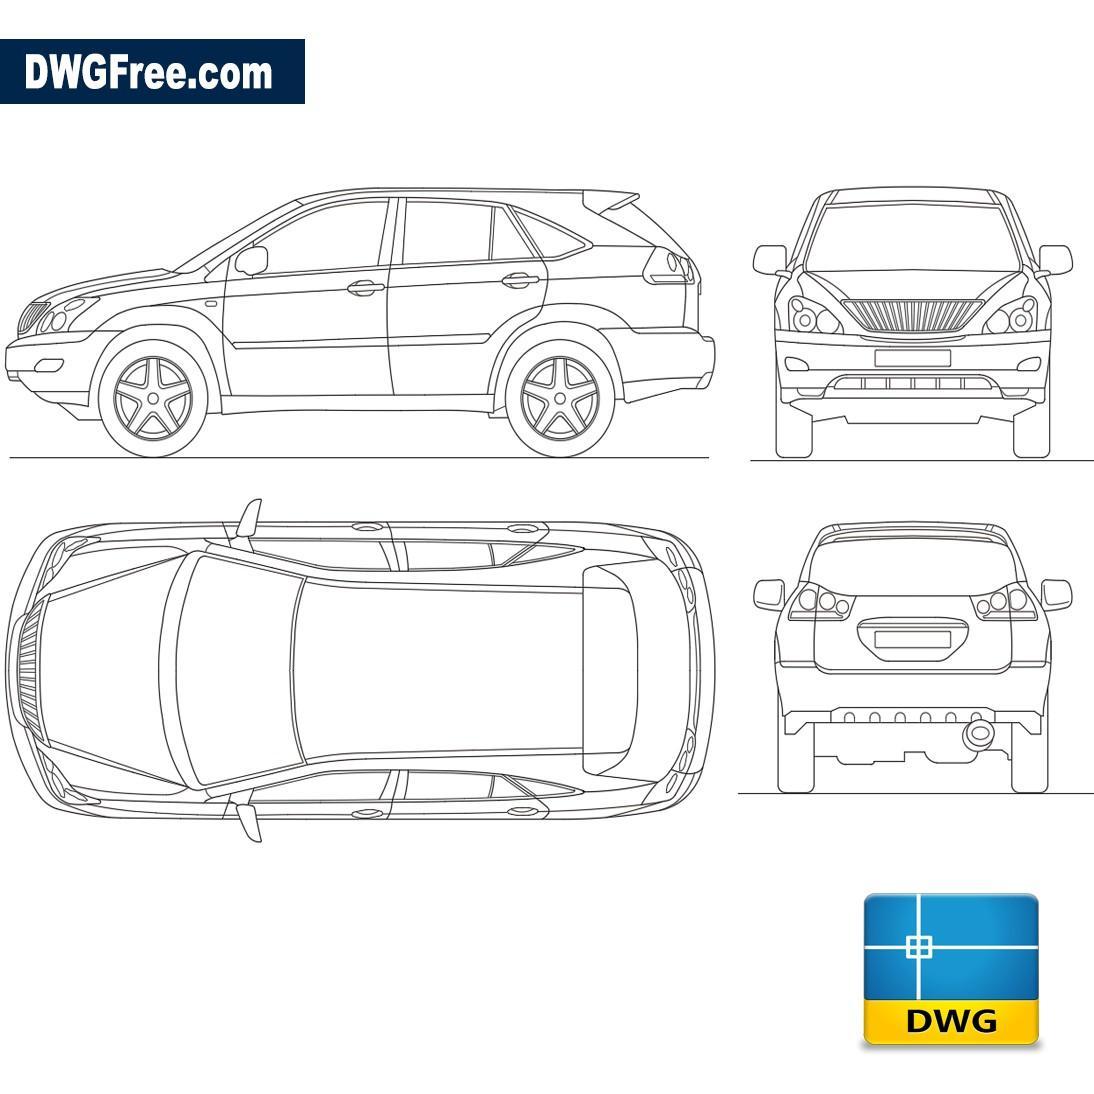 Lexus Rx 300 Dwg Download Autocad Blocks Model Download